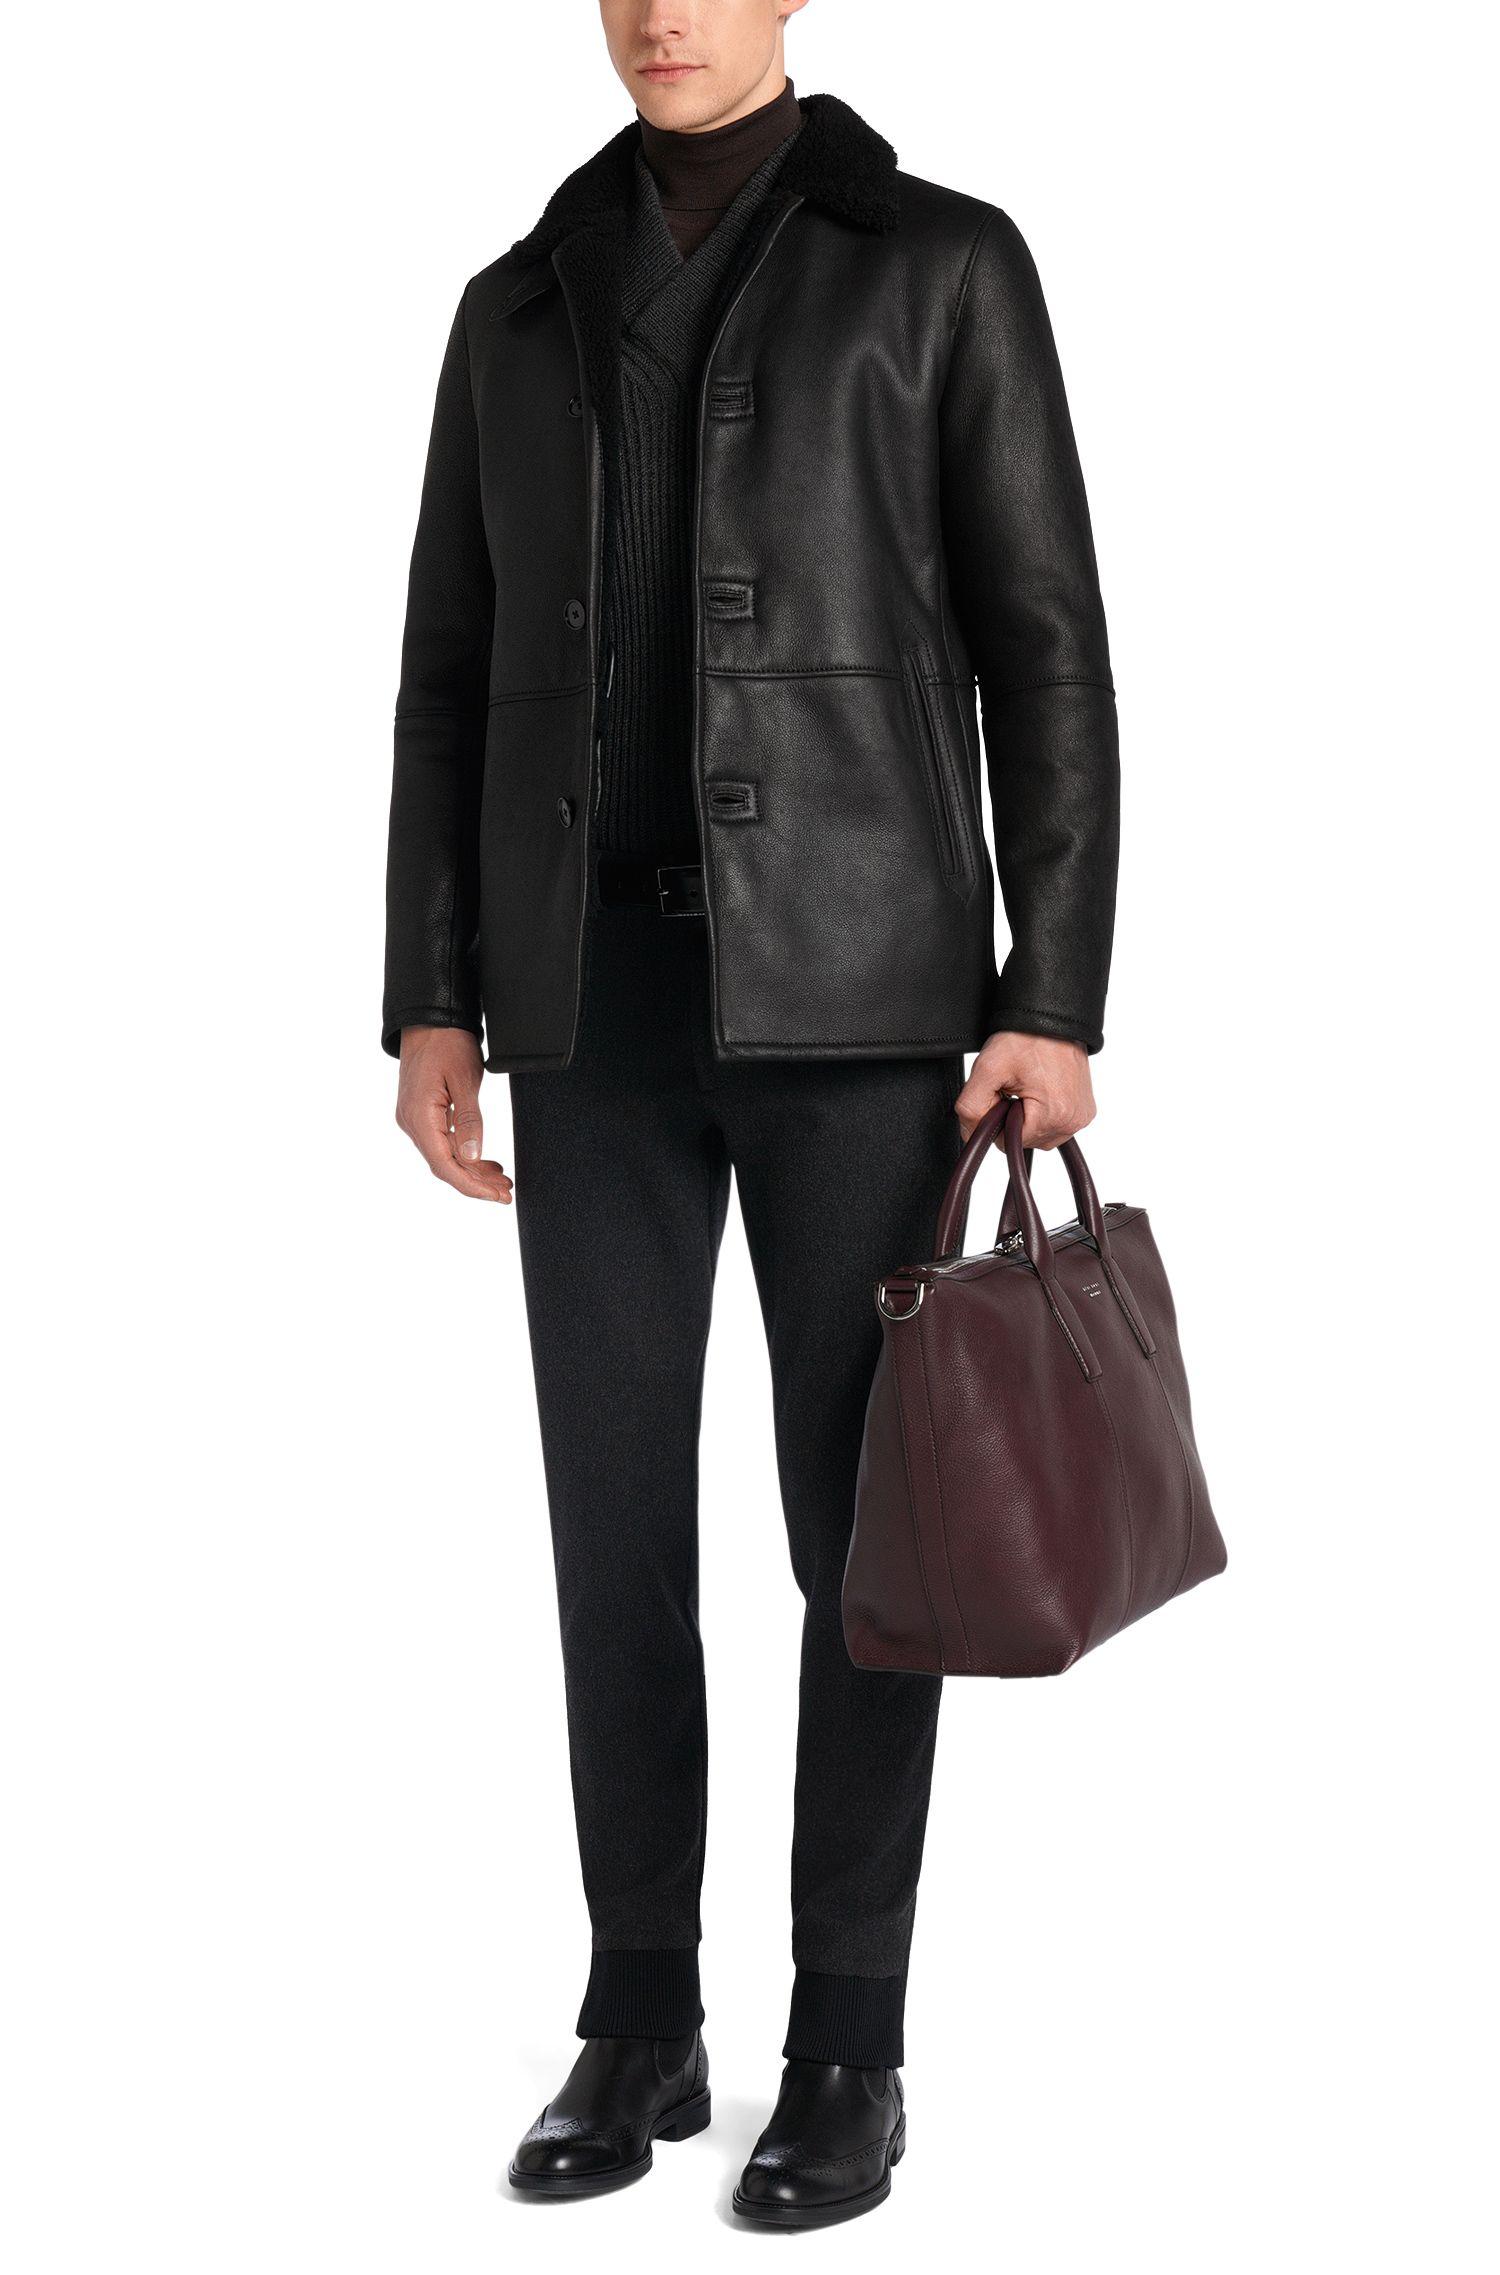 Regular-Fit Tailored Lederjacke mit Lammfell-Futter: 'T-Cubis'